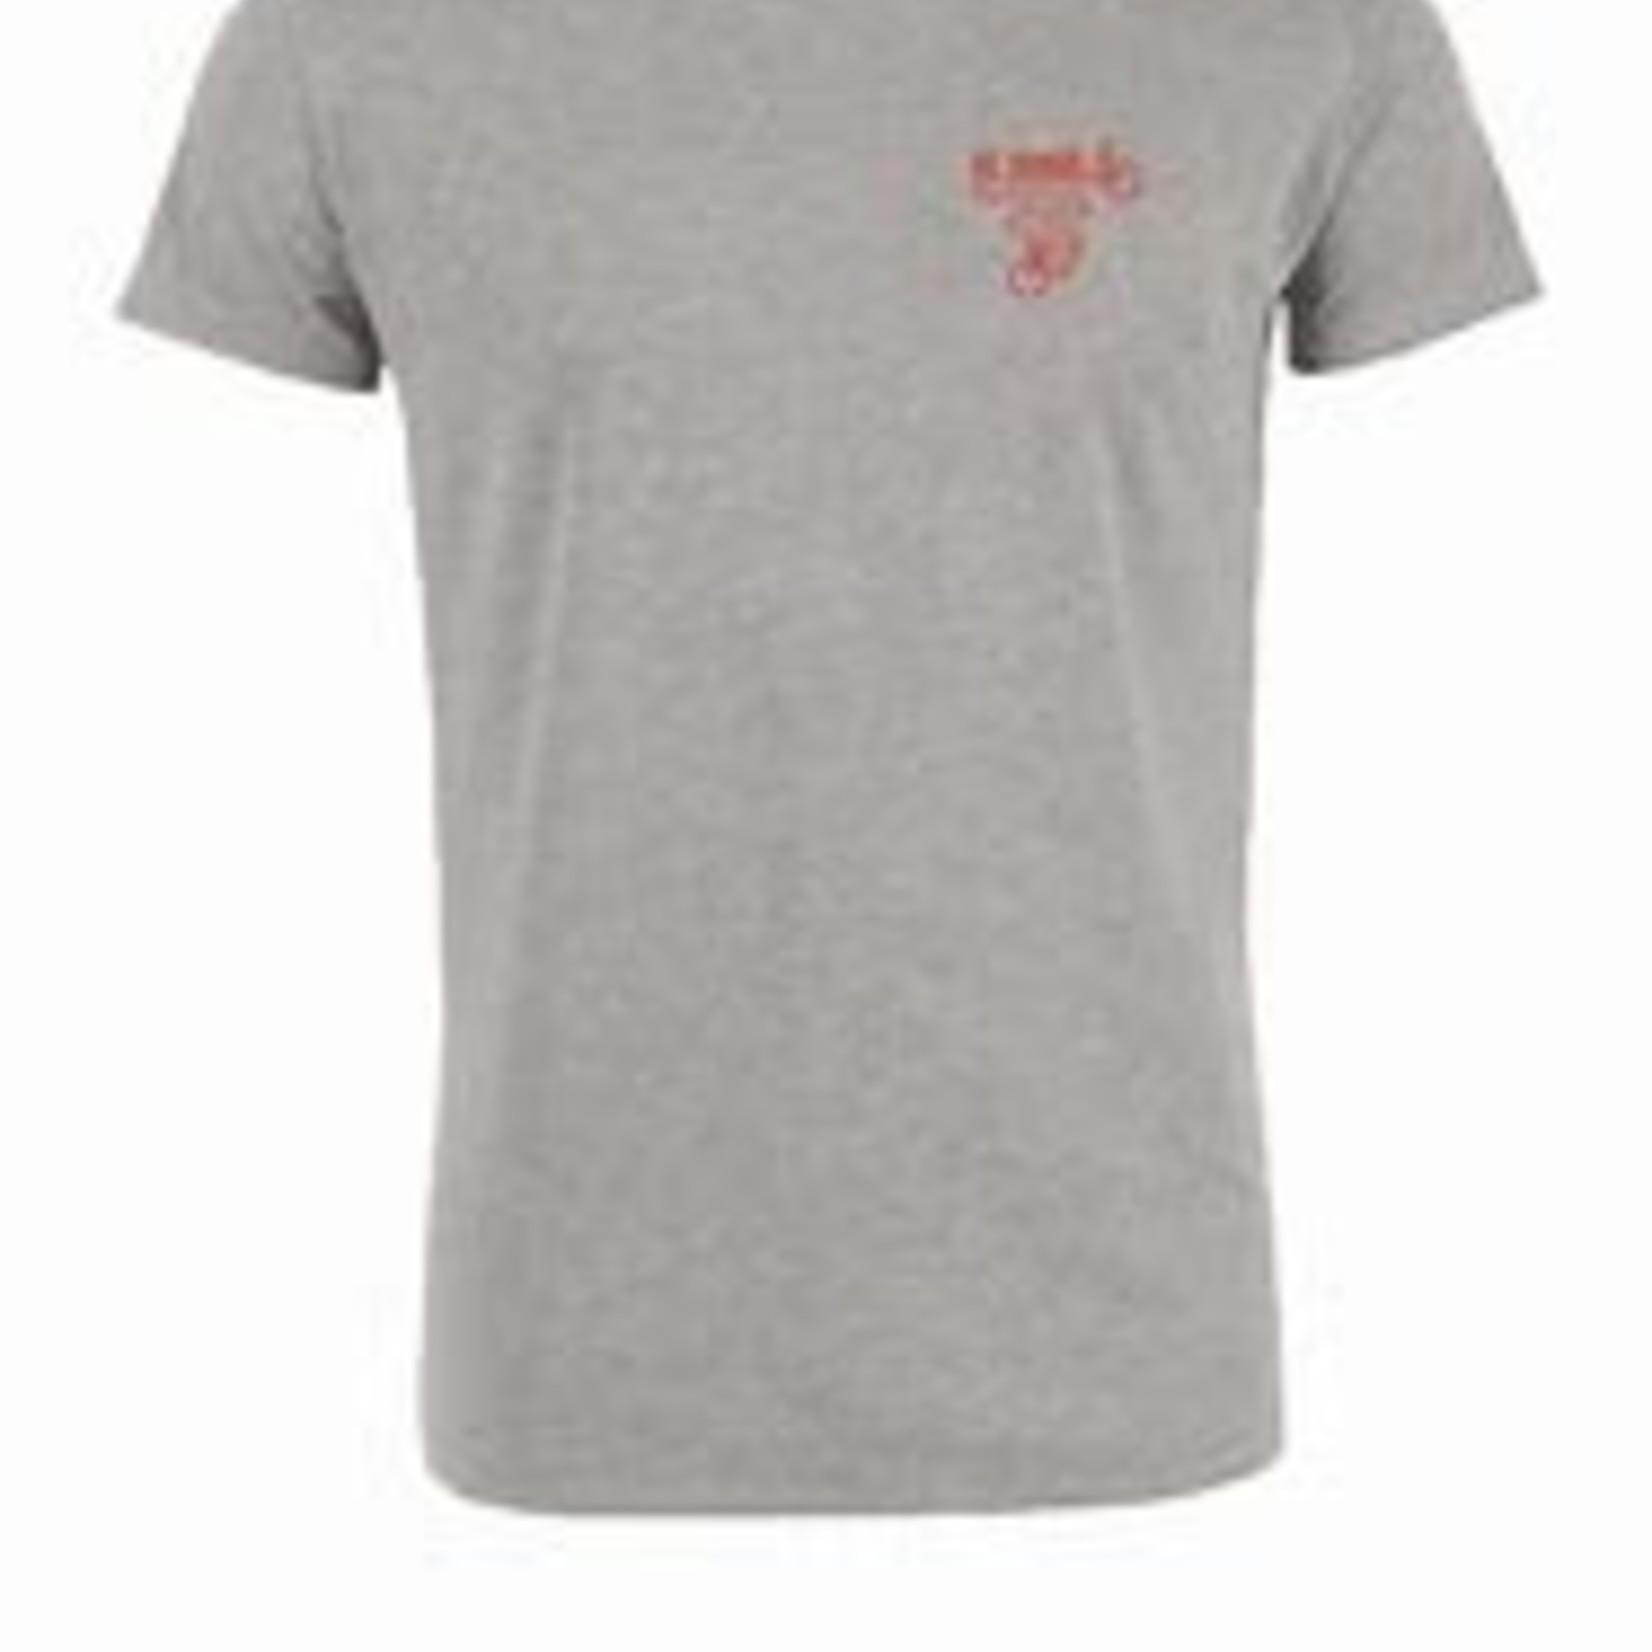 T-shirt 'De Ronde' (grey)